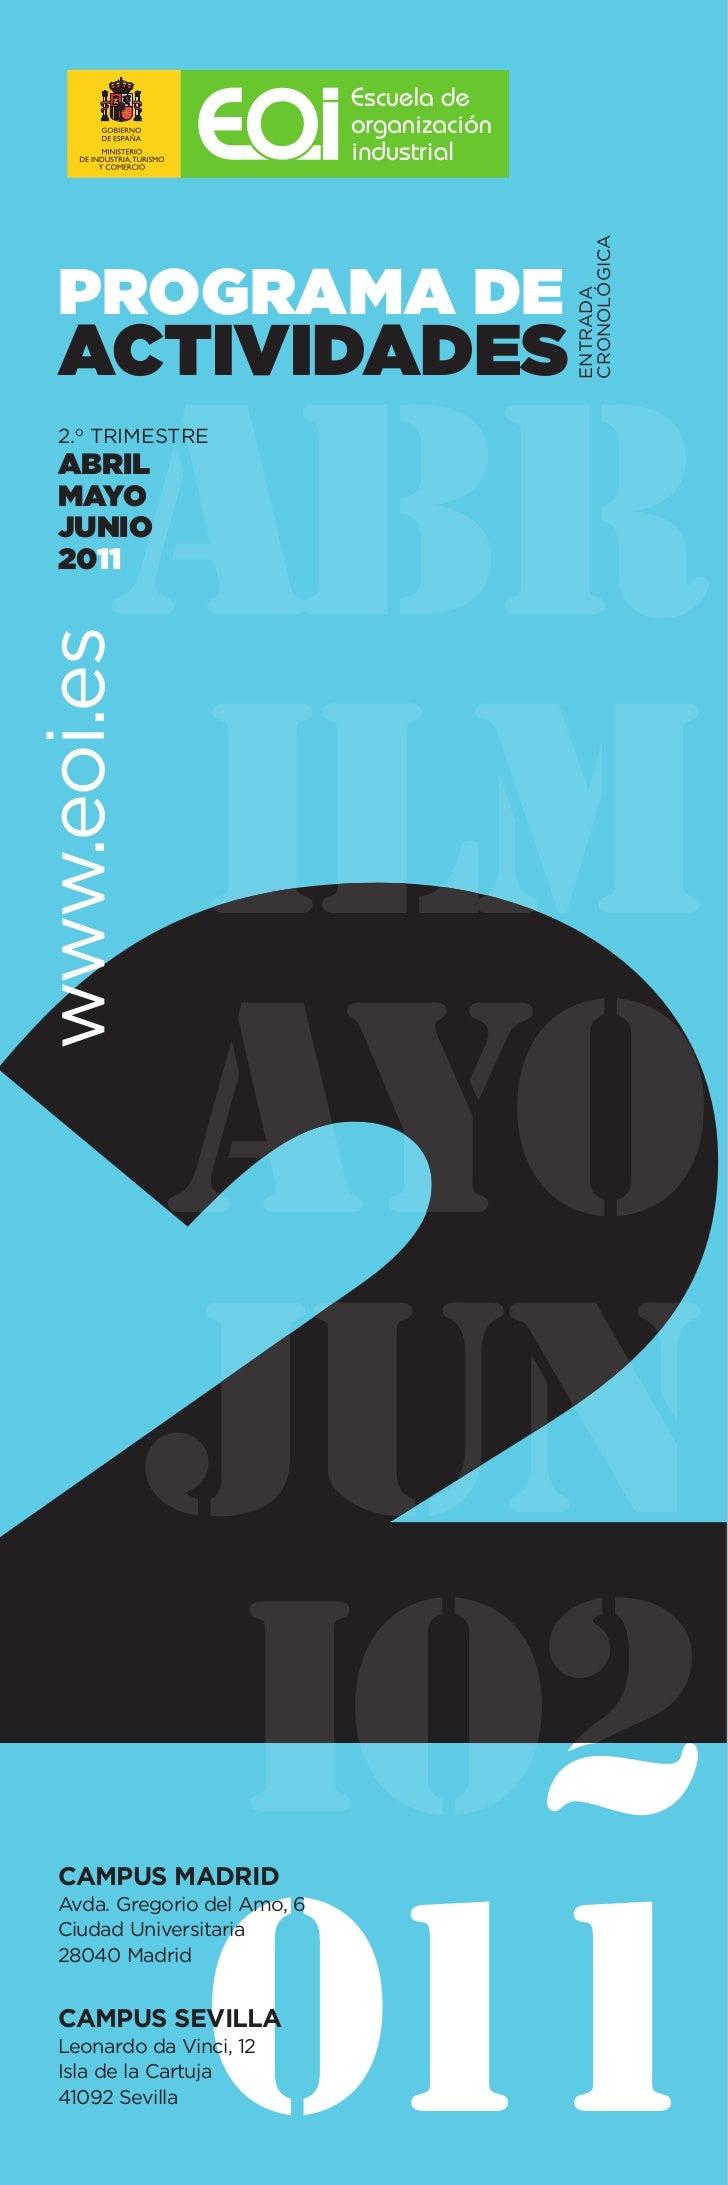 Calendario eoi 2o_trimestre 2011 (horizontal)